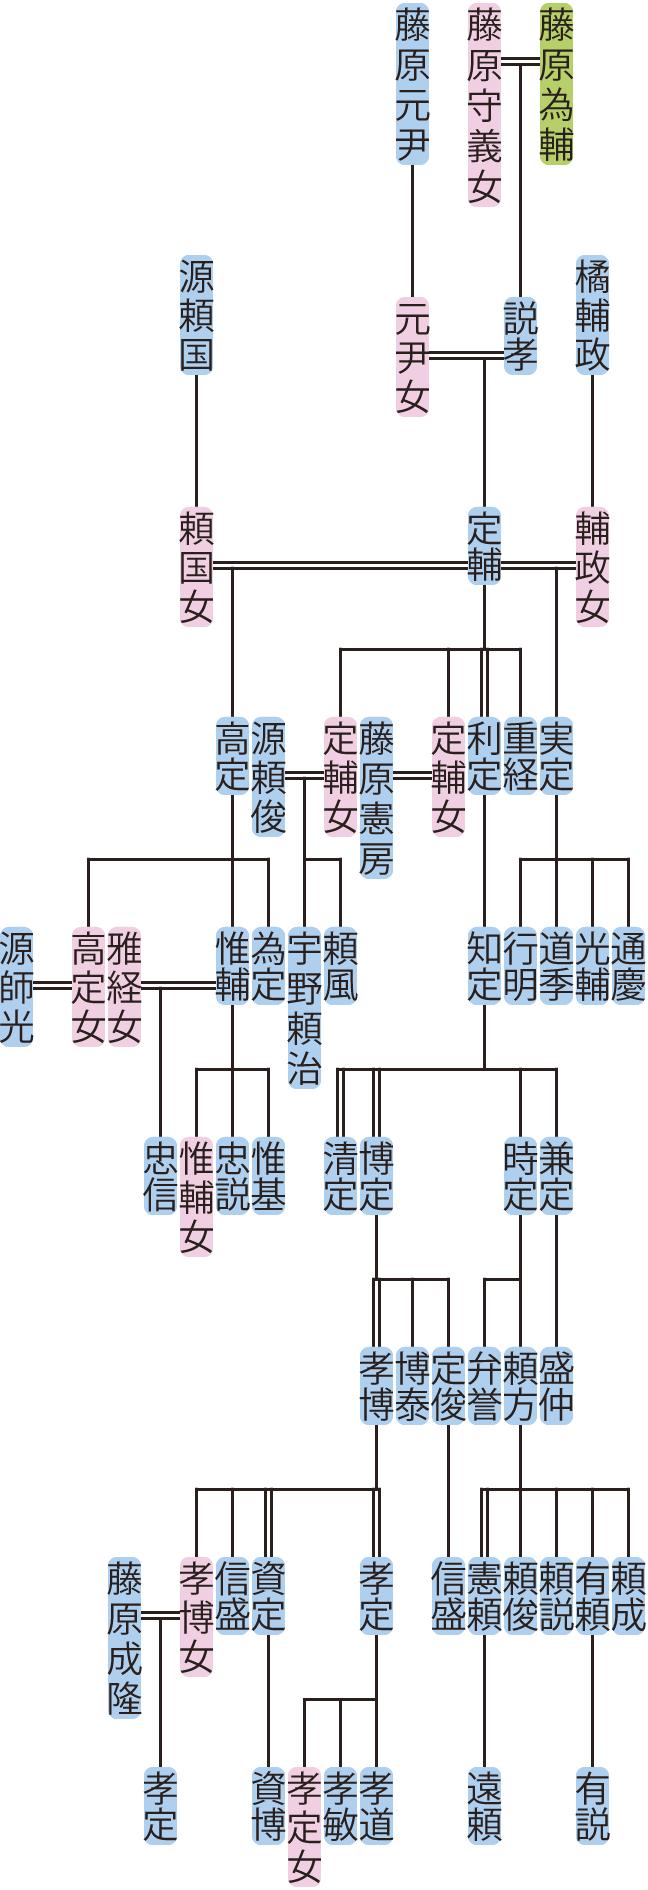 藤原定輔~孝博の系図